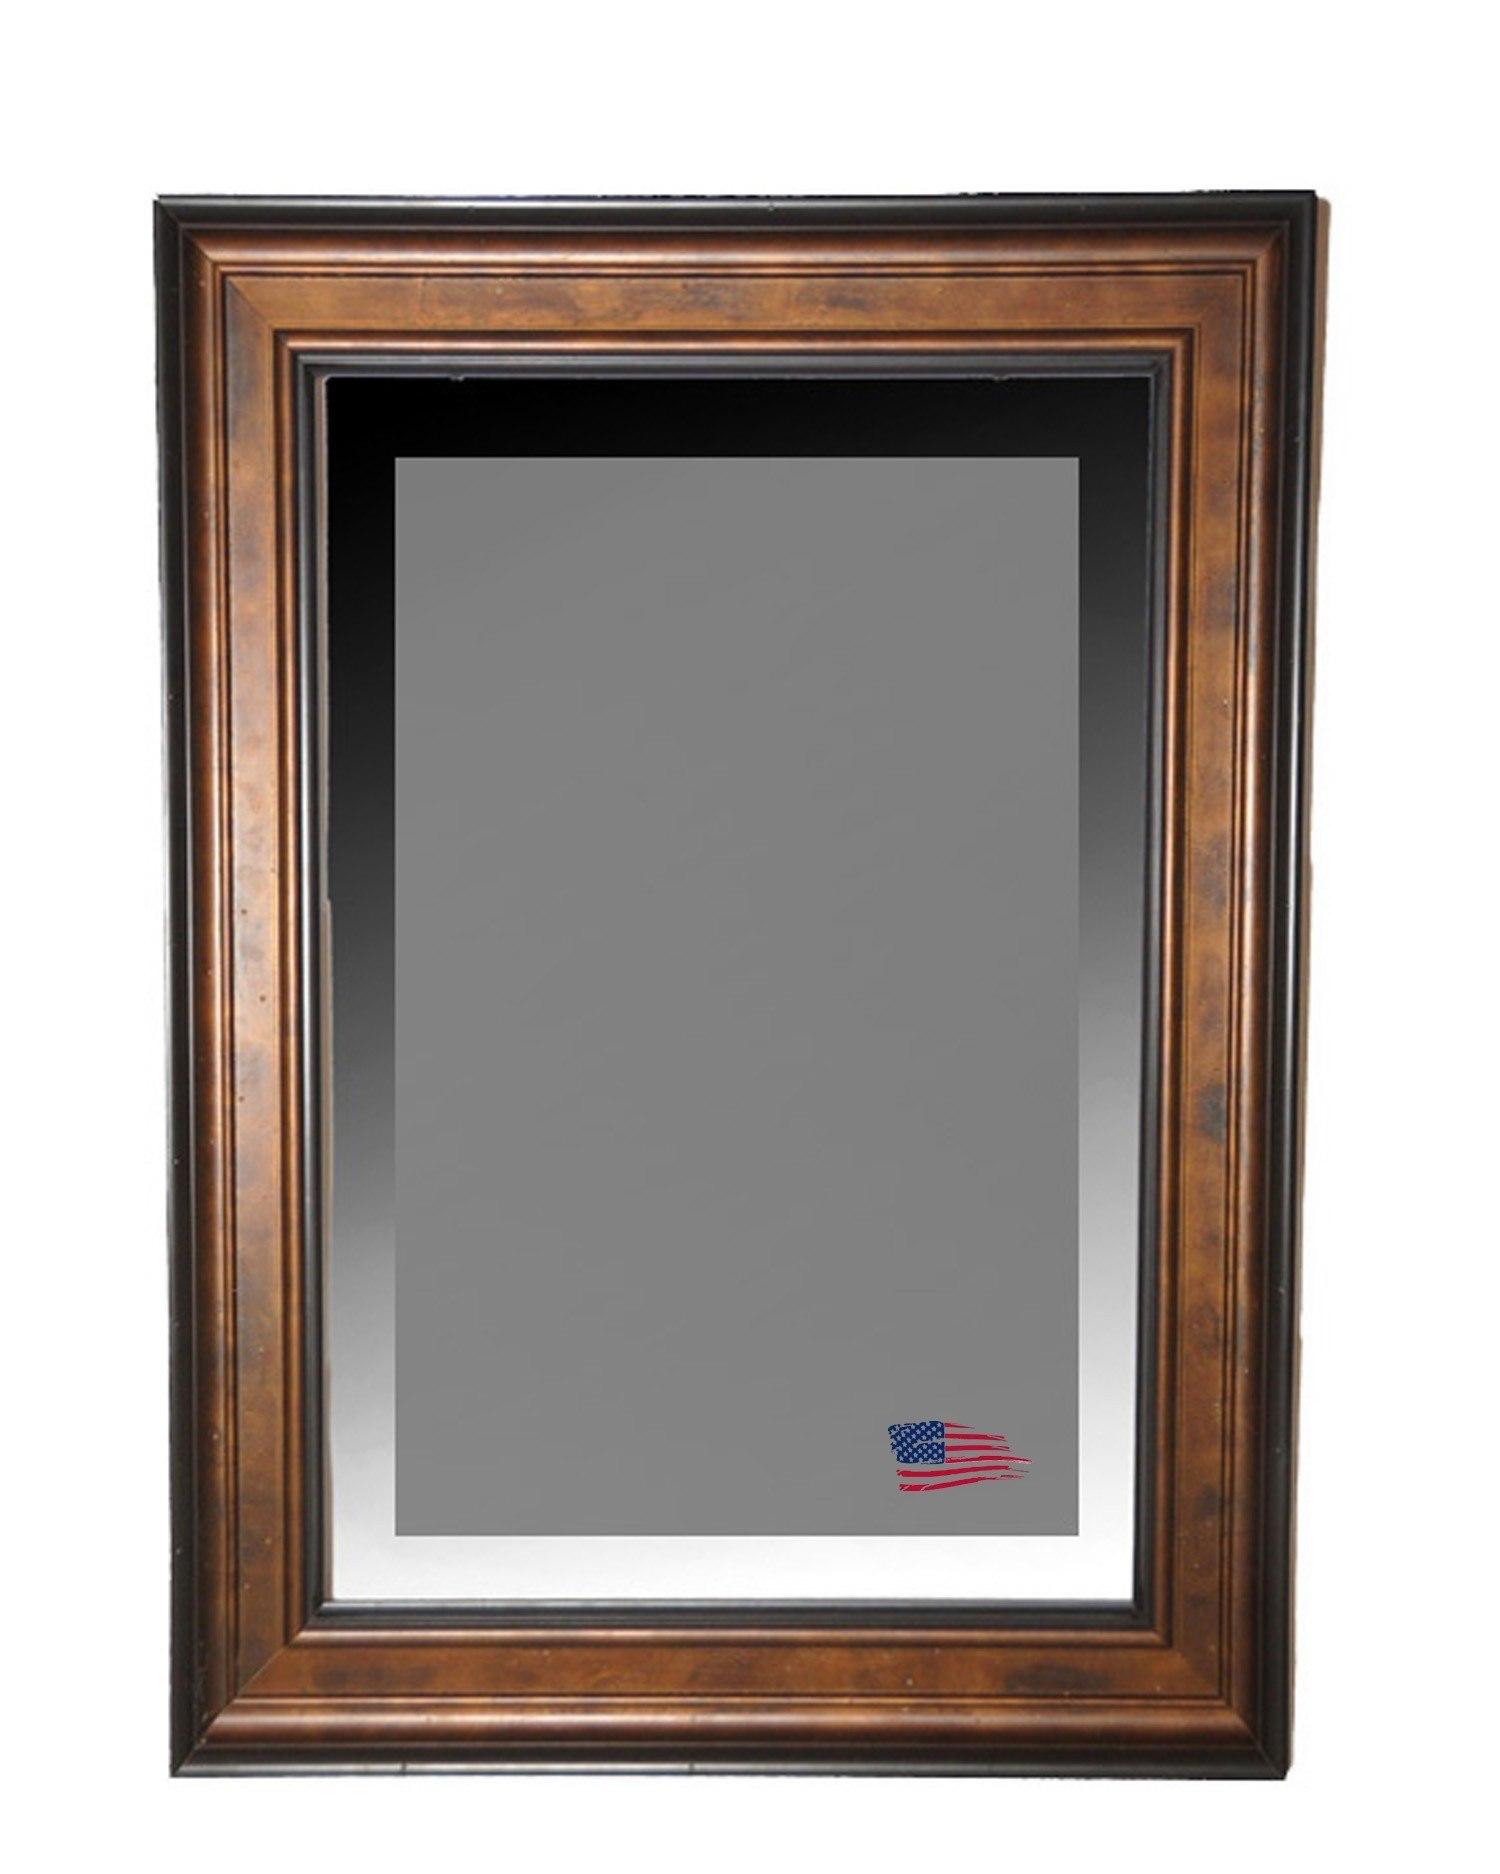 Rayne Mirrors R0015LV 44.75 x 38.75 Inch Bronze and Black Wall Mirror